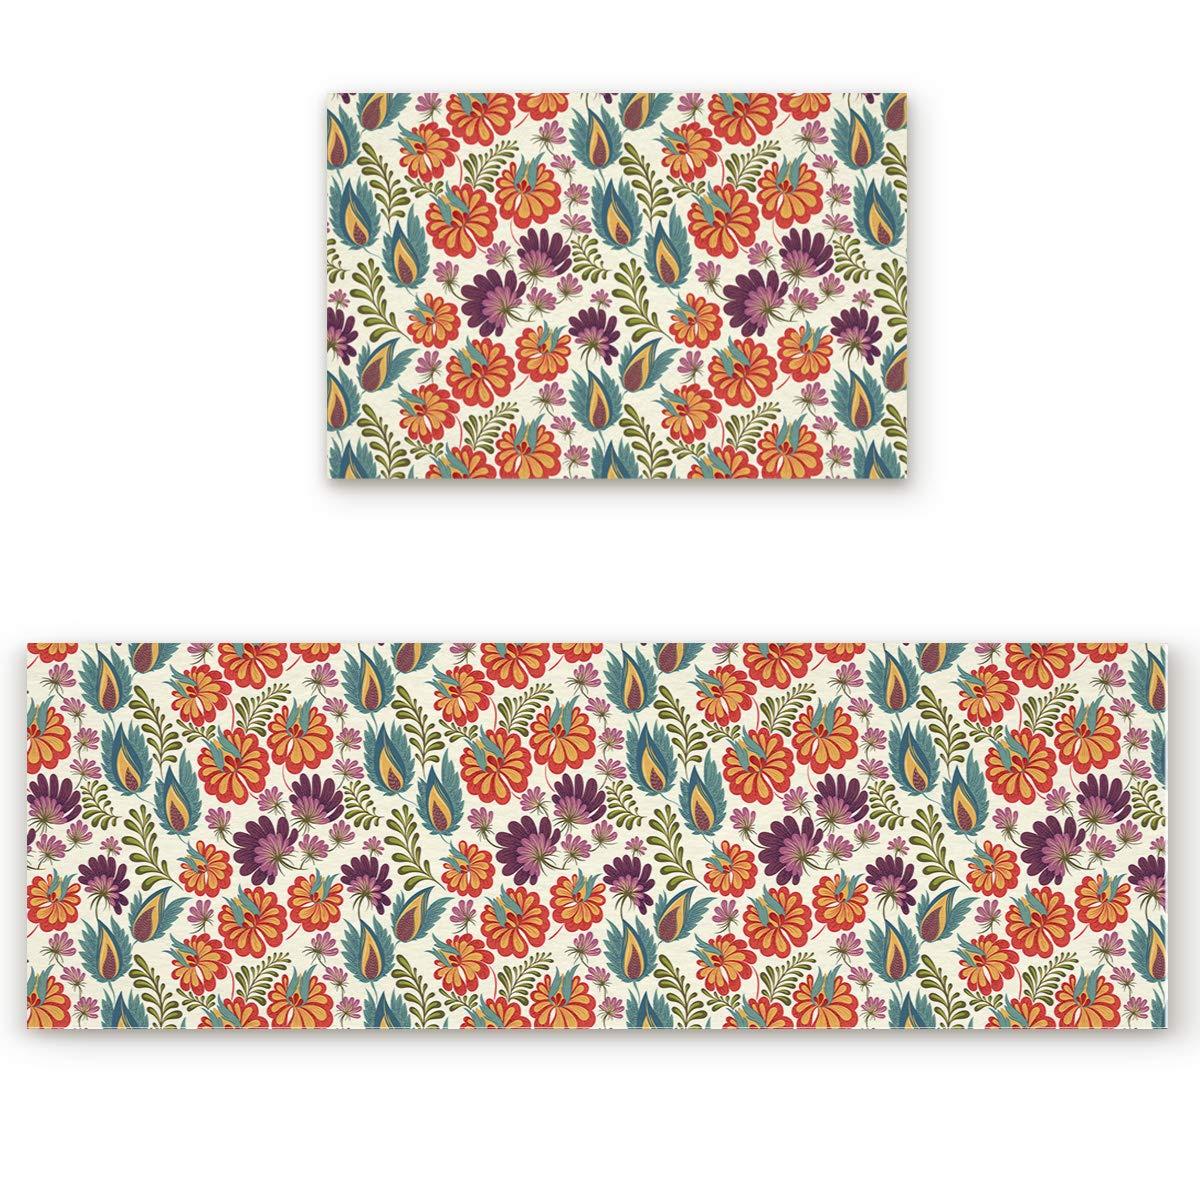 23.6\ SODIKA 2 Pieces Kitchen Rug Set,Non-Skid Slip Washable Doormat Floor Runner Bathroom Area Rug Carpet,Paisley Pattern (23.6x35.4in+23.6x70.9 inches)